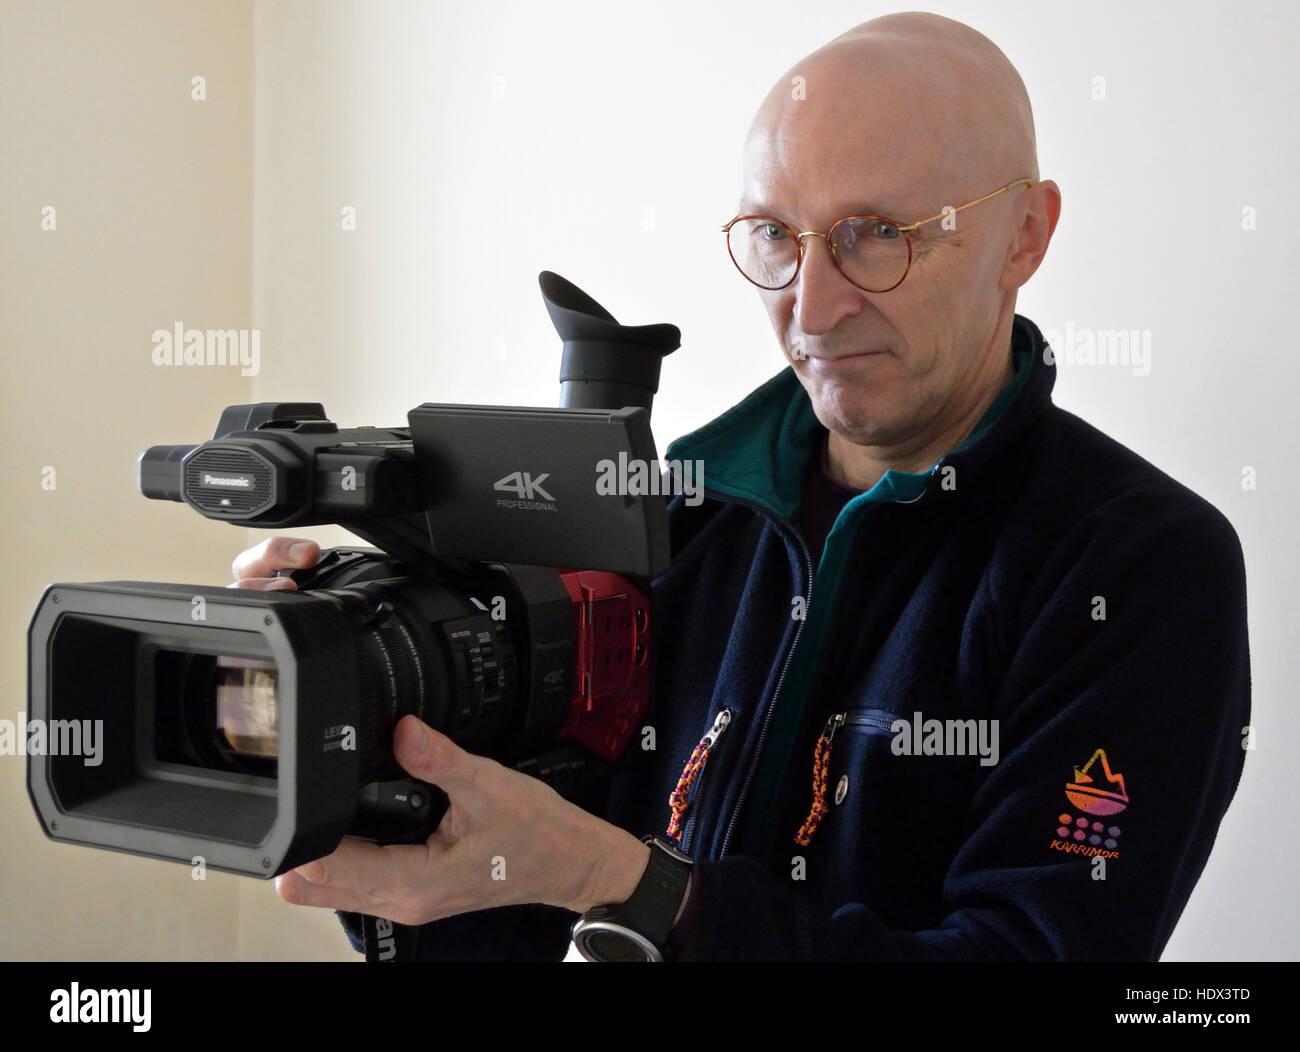 Clive Tully FRGS holding Panasonic AG-DVX200 professional video camera Stock Photo